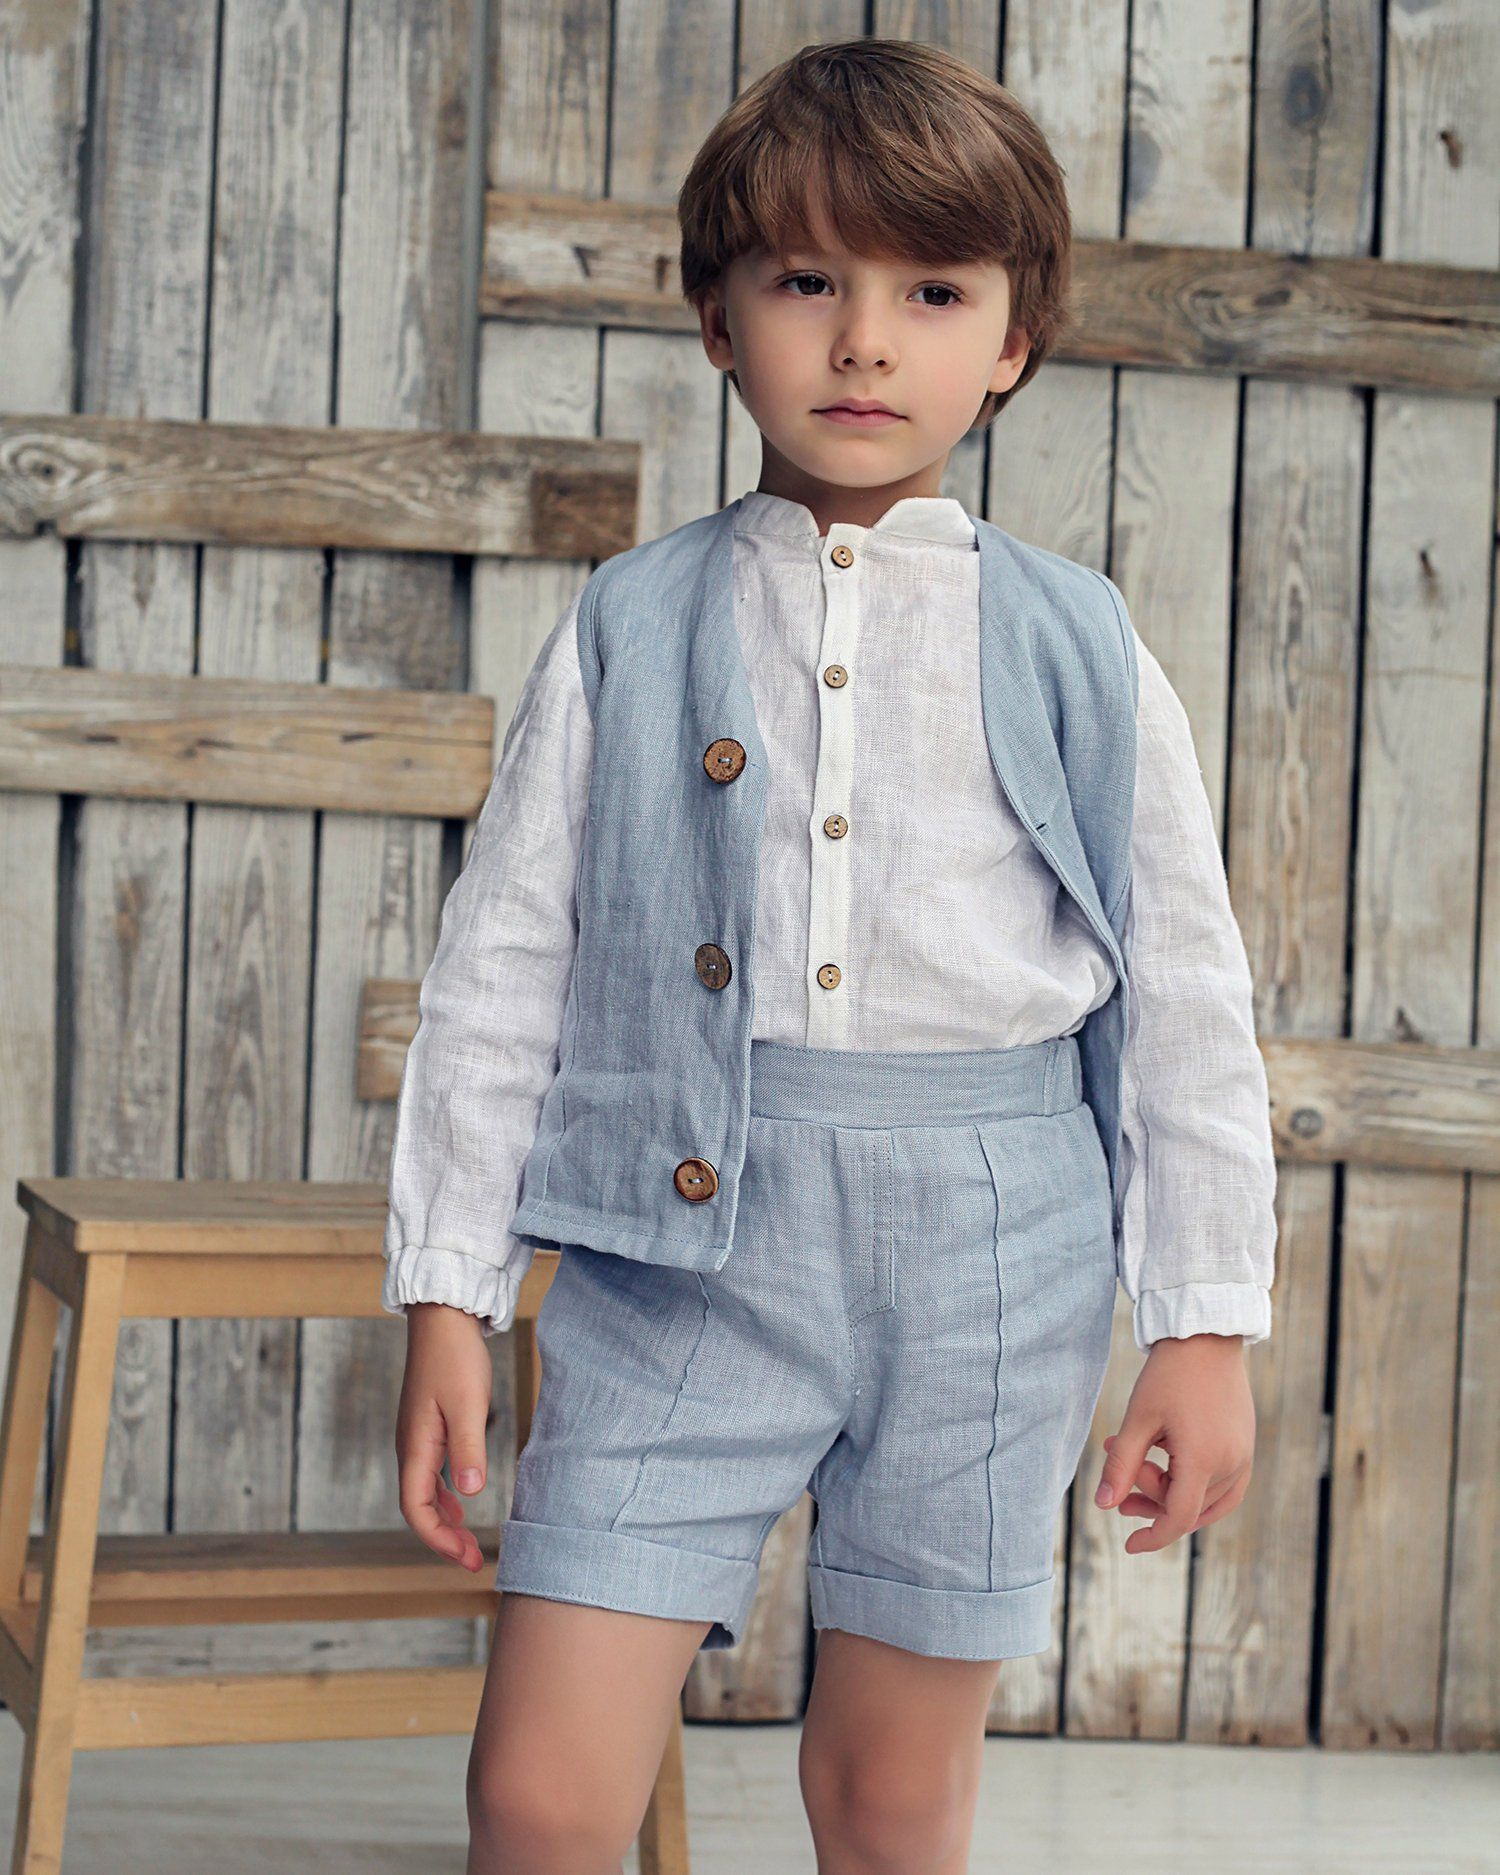 White Linen Boys Dress Shirt Blue Linen Top For Boys Linen Clothes For Kids Linen Boys Outfit Boy Shirt Linen Top White Boy Shirt Boys Linen Shirt Boys Dress Shirts [ 1875 x 1500 Pixel ]